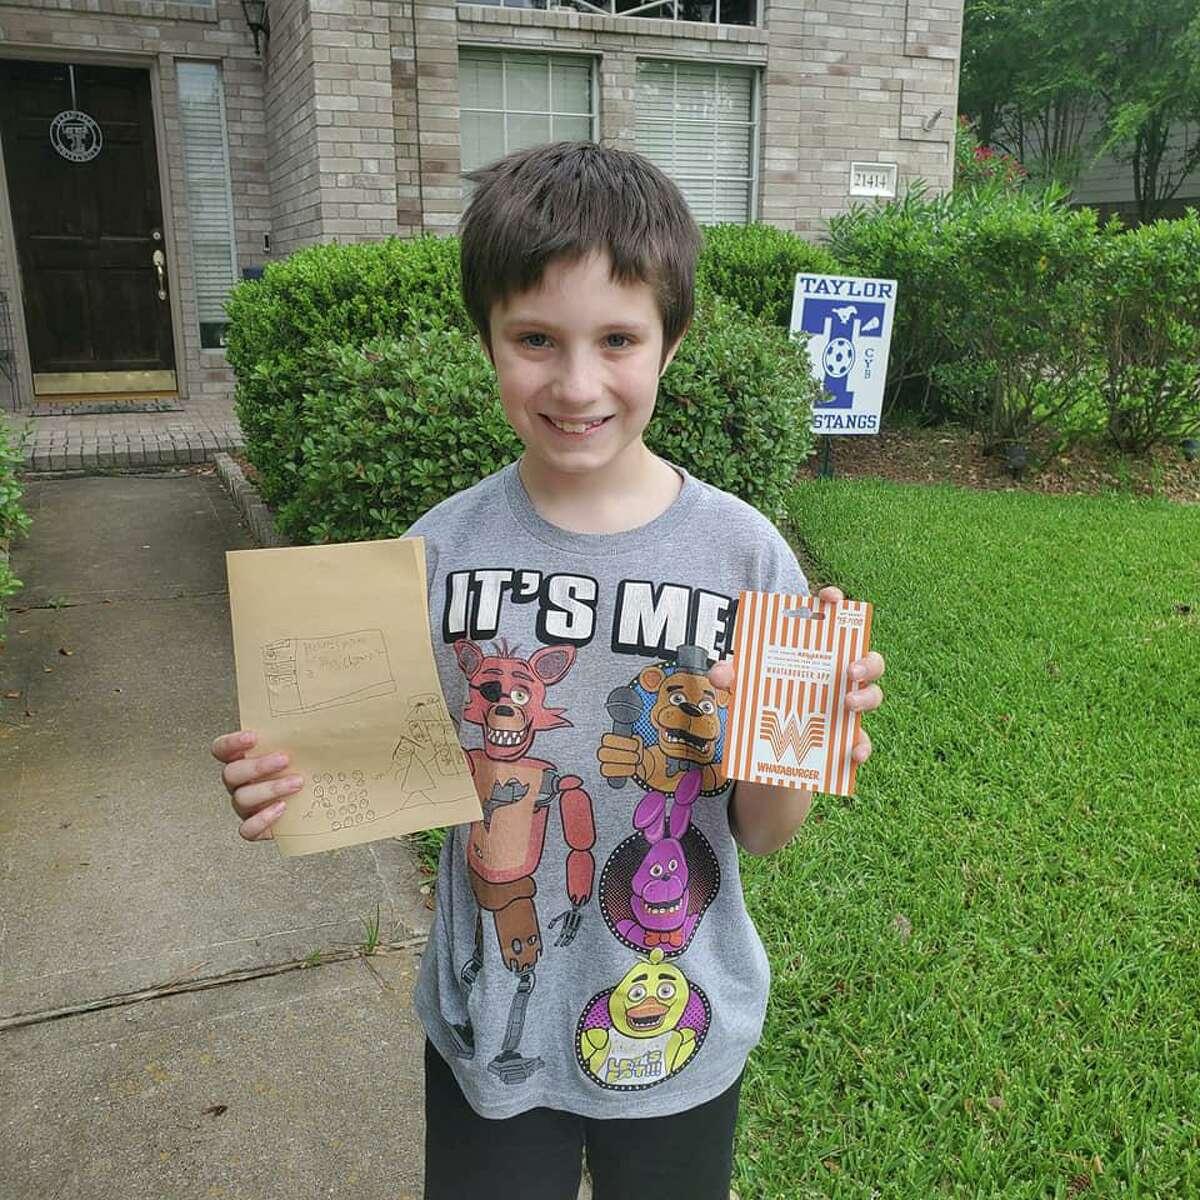 Tres Simpson brings his teacher a Whataburger gift card and a homemade card for Teacher Appreciation Week, which runs May 4-8.